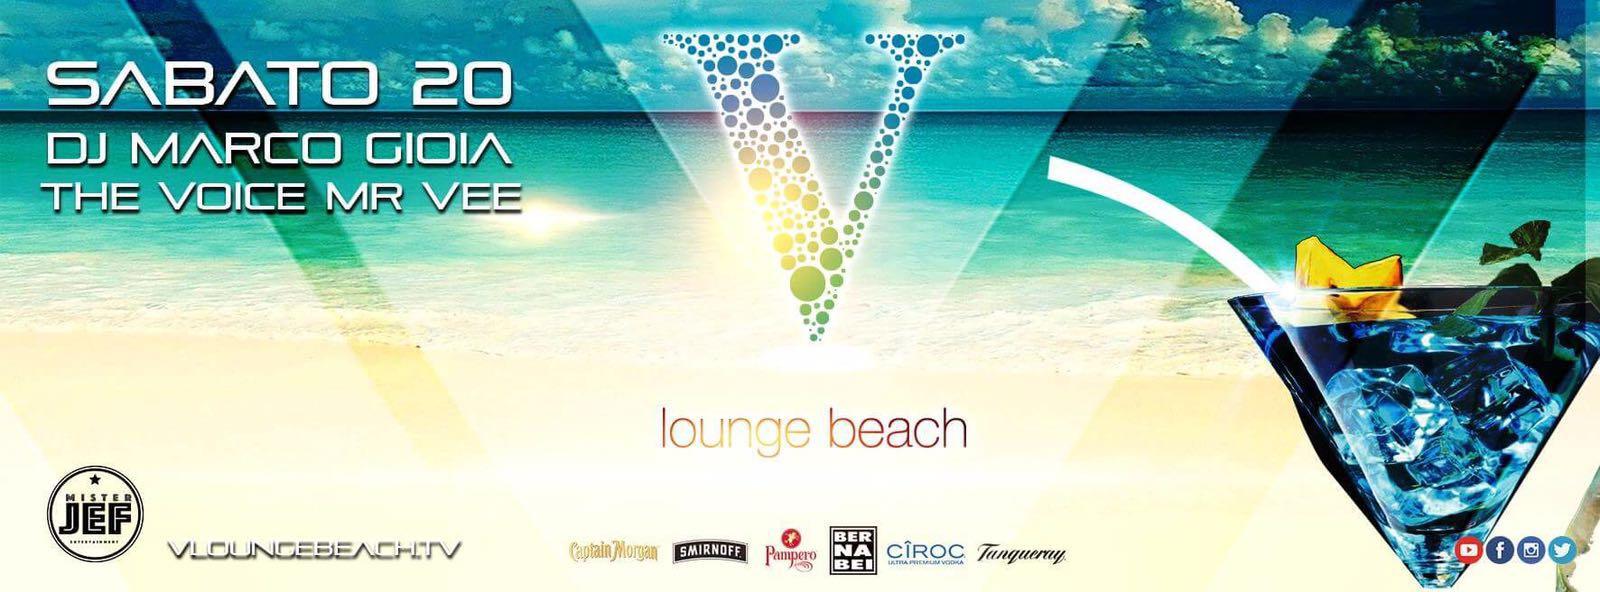 Aperitivo Disco Ostia V Lounge Beach